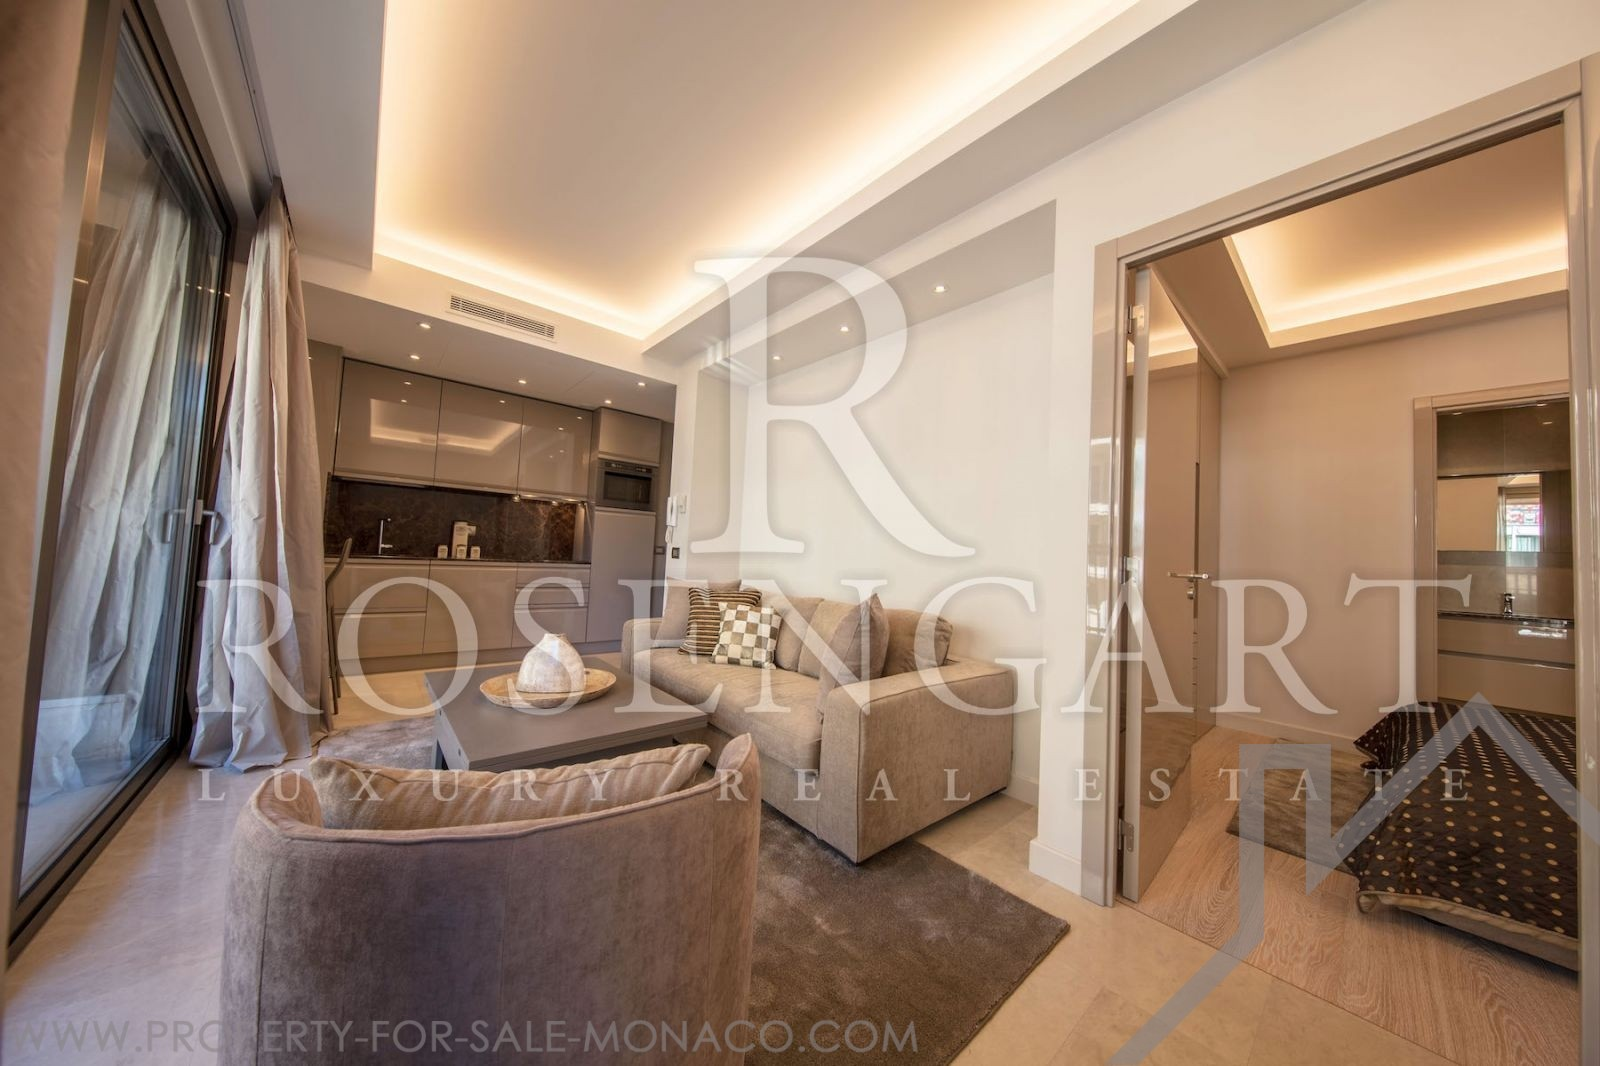 Appartement design haut de gamme vue grand prix for Grand appartement design